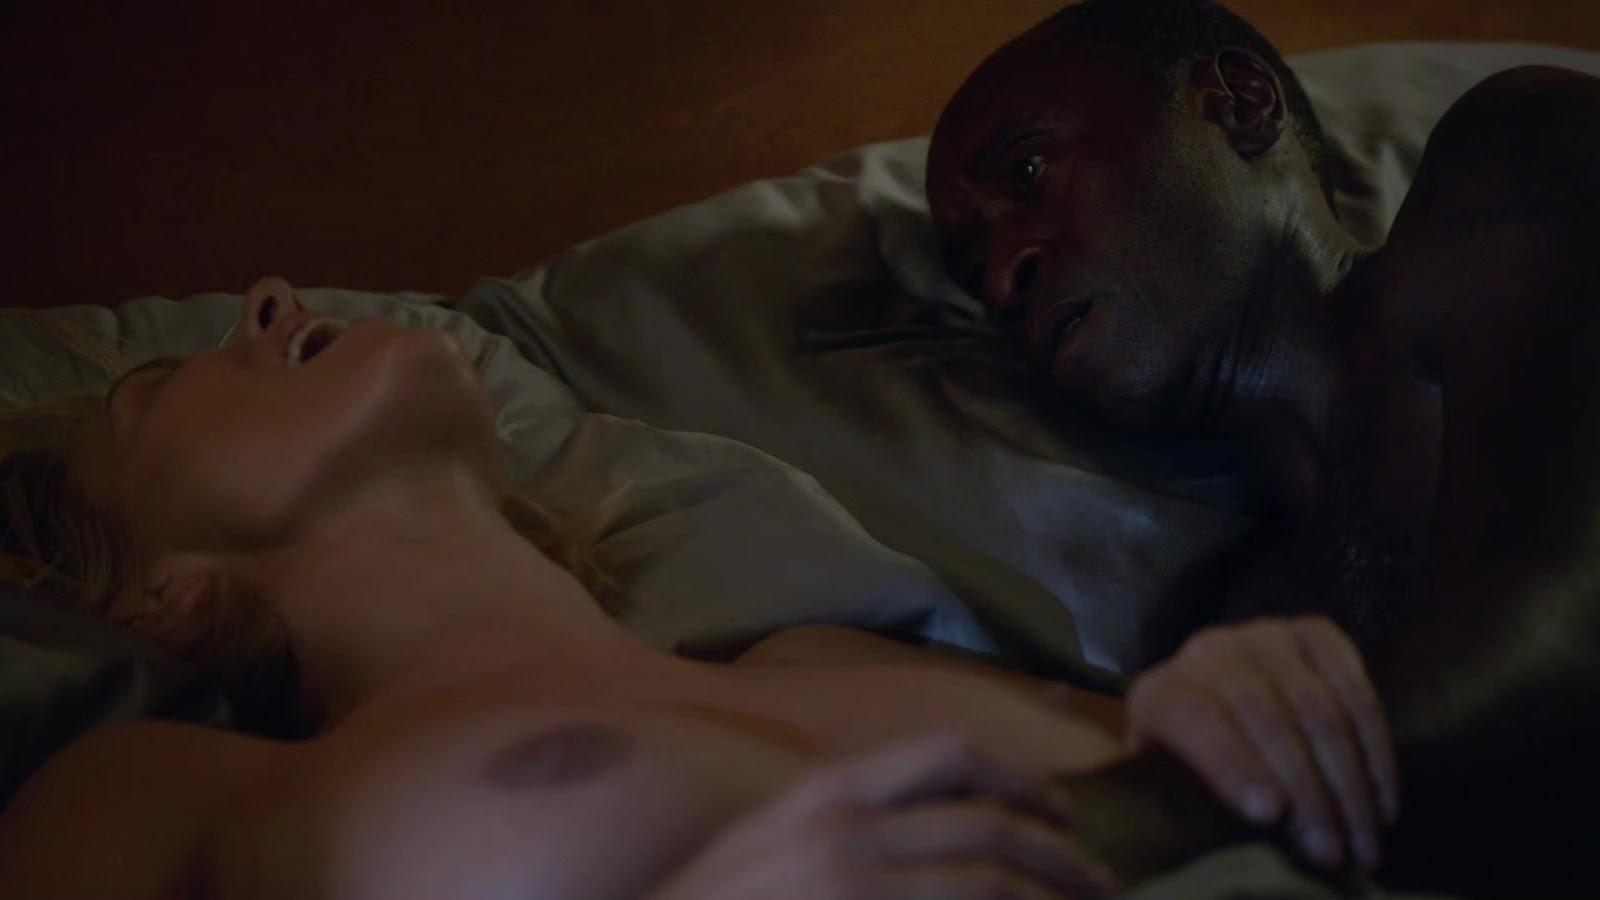 Darlanne fluegel nude topless and debra feuer nude brief topless